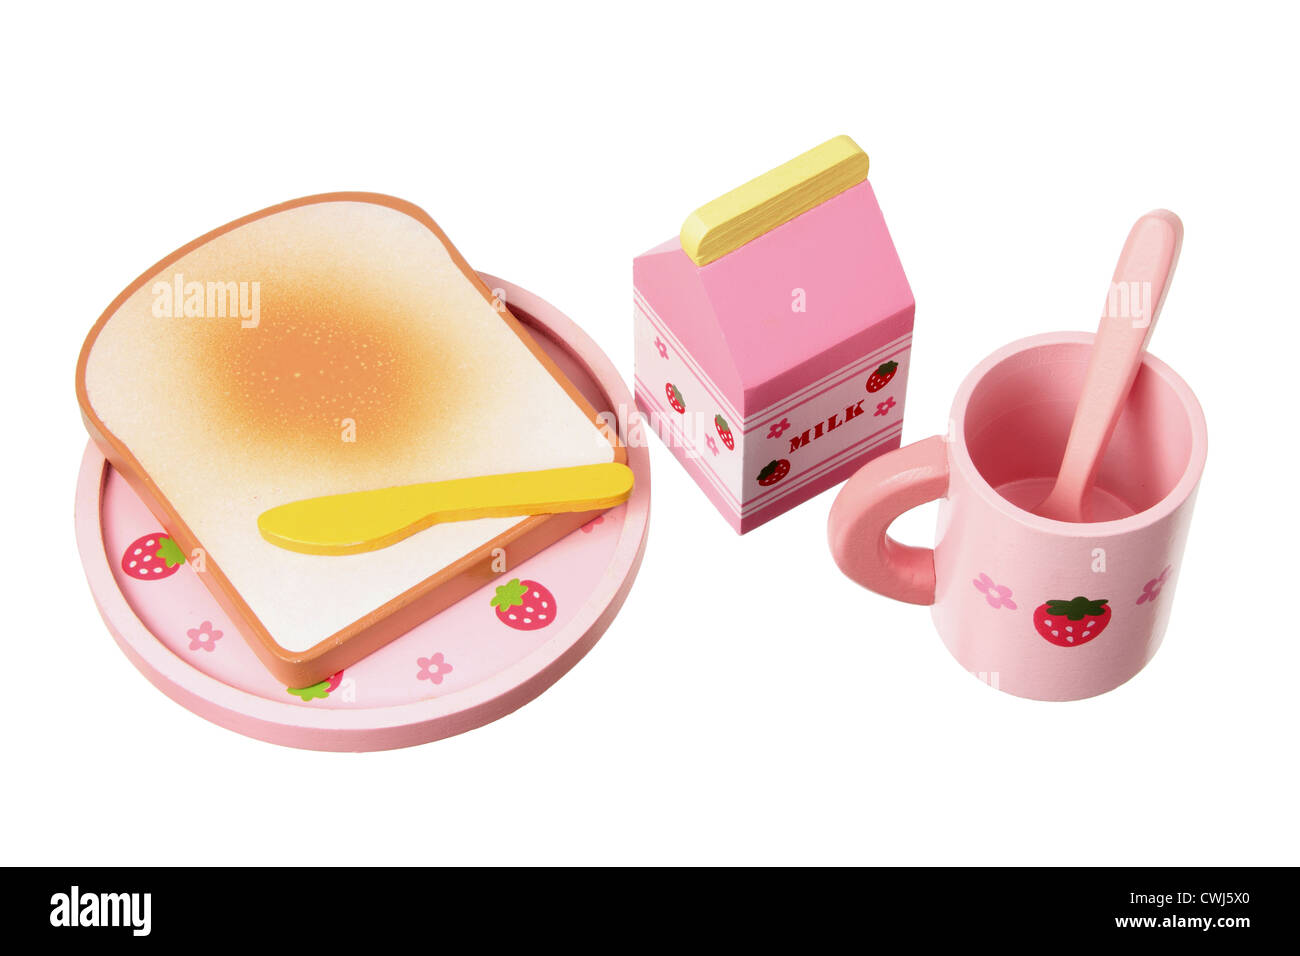 Holzspielzeug-Frühstücks-Set Stockbild